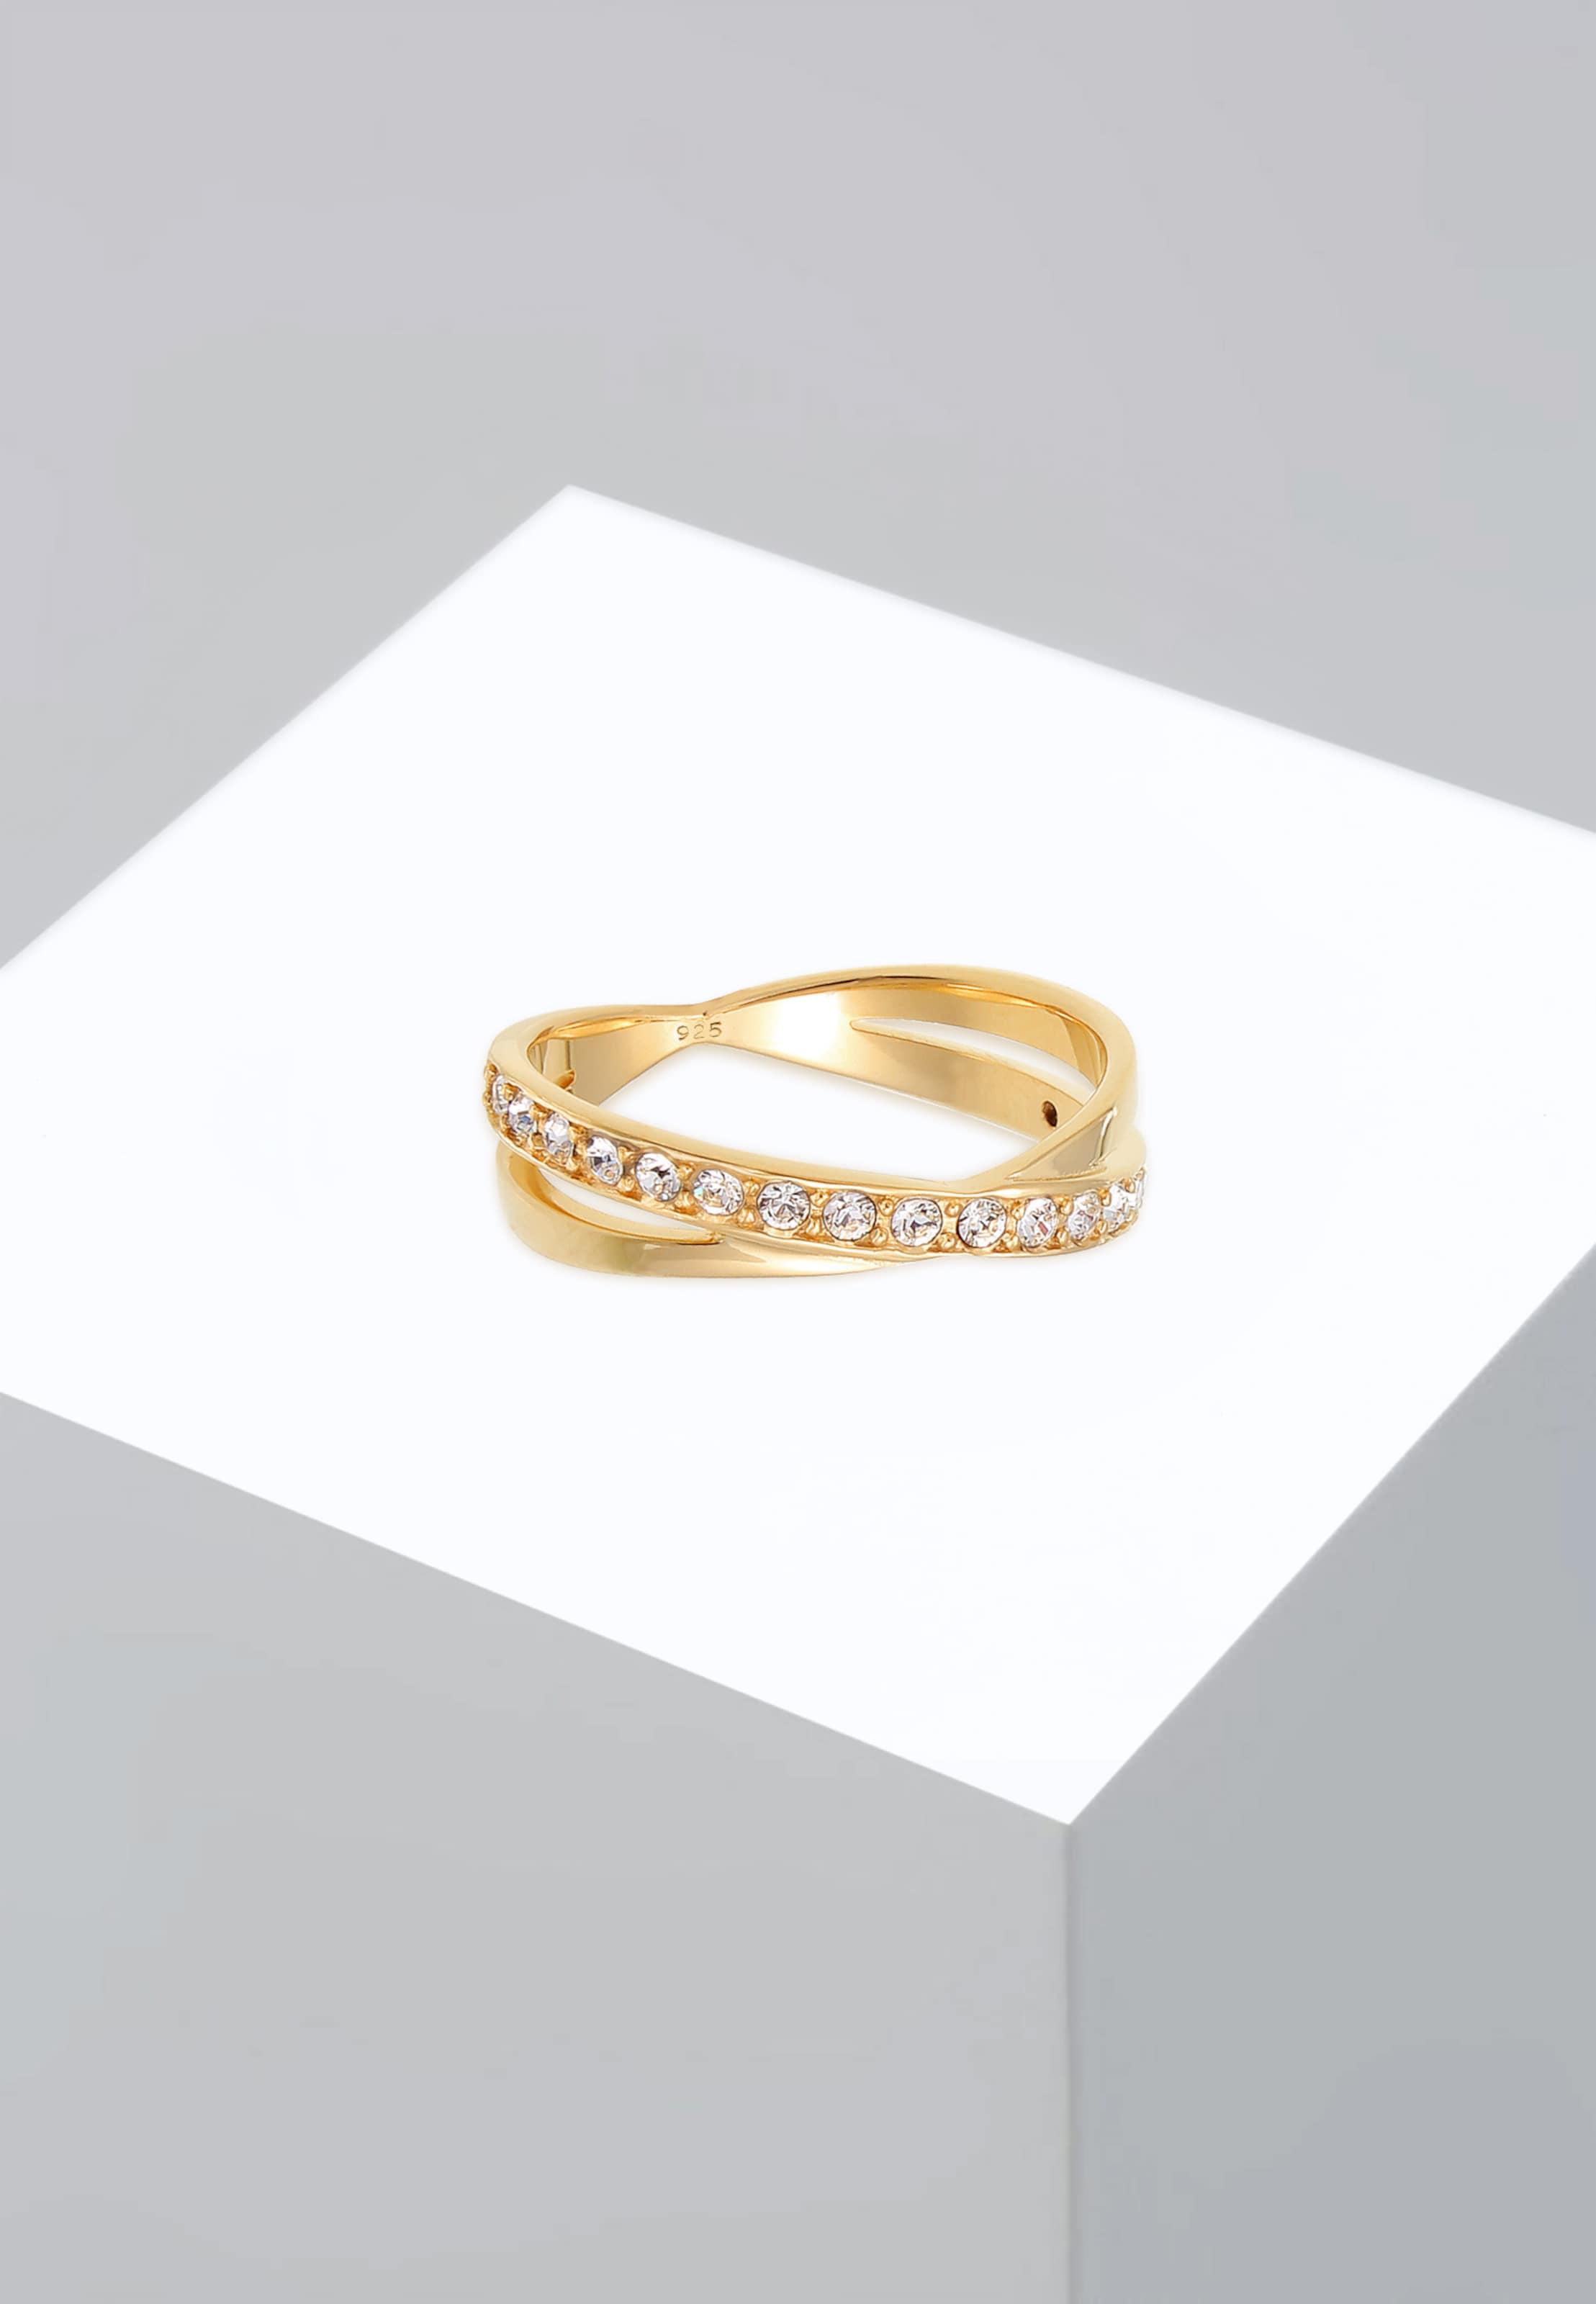 Gold In Elli In Ring In Elli Ring Gold Ring Elli Elli Gold mN0w8n